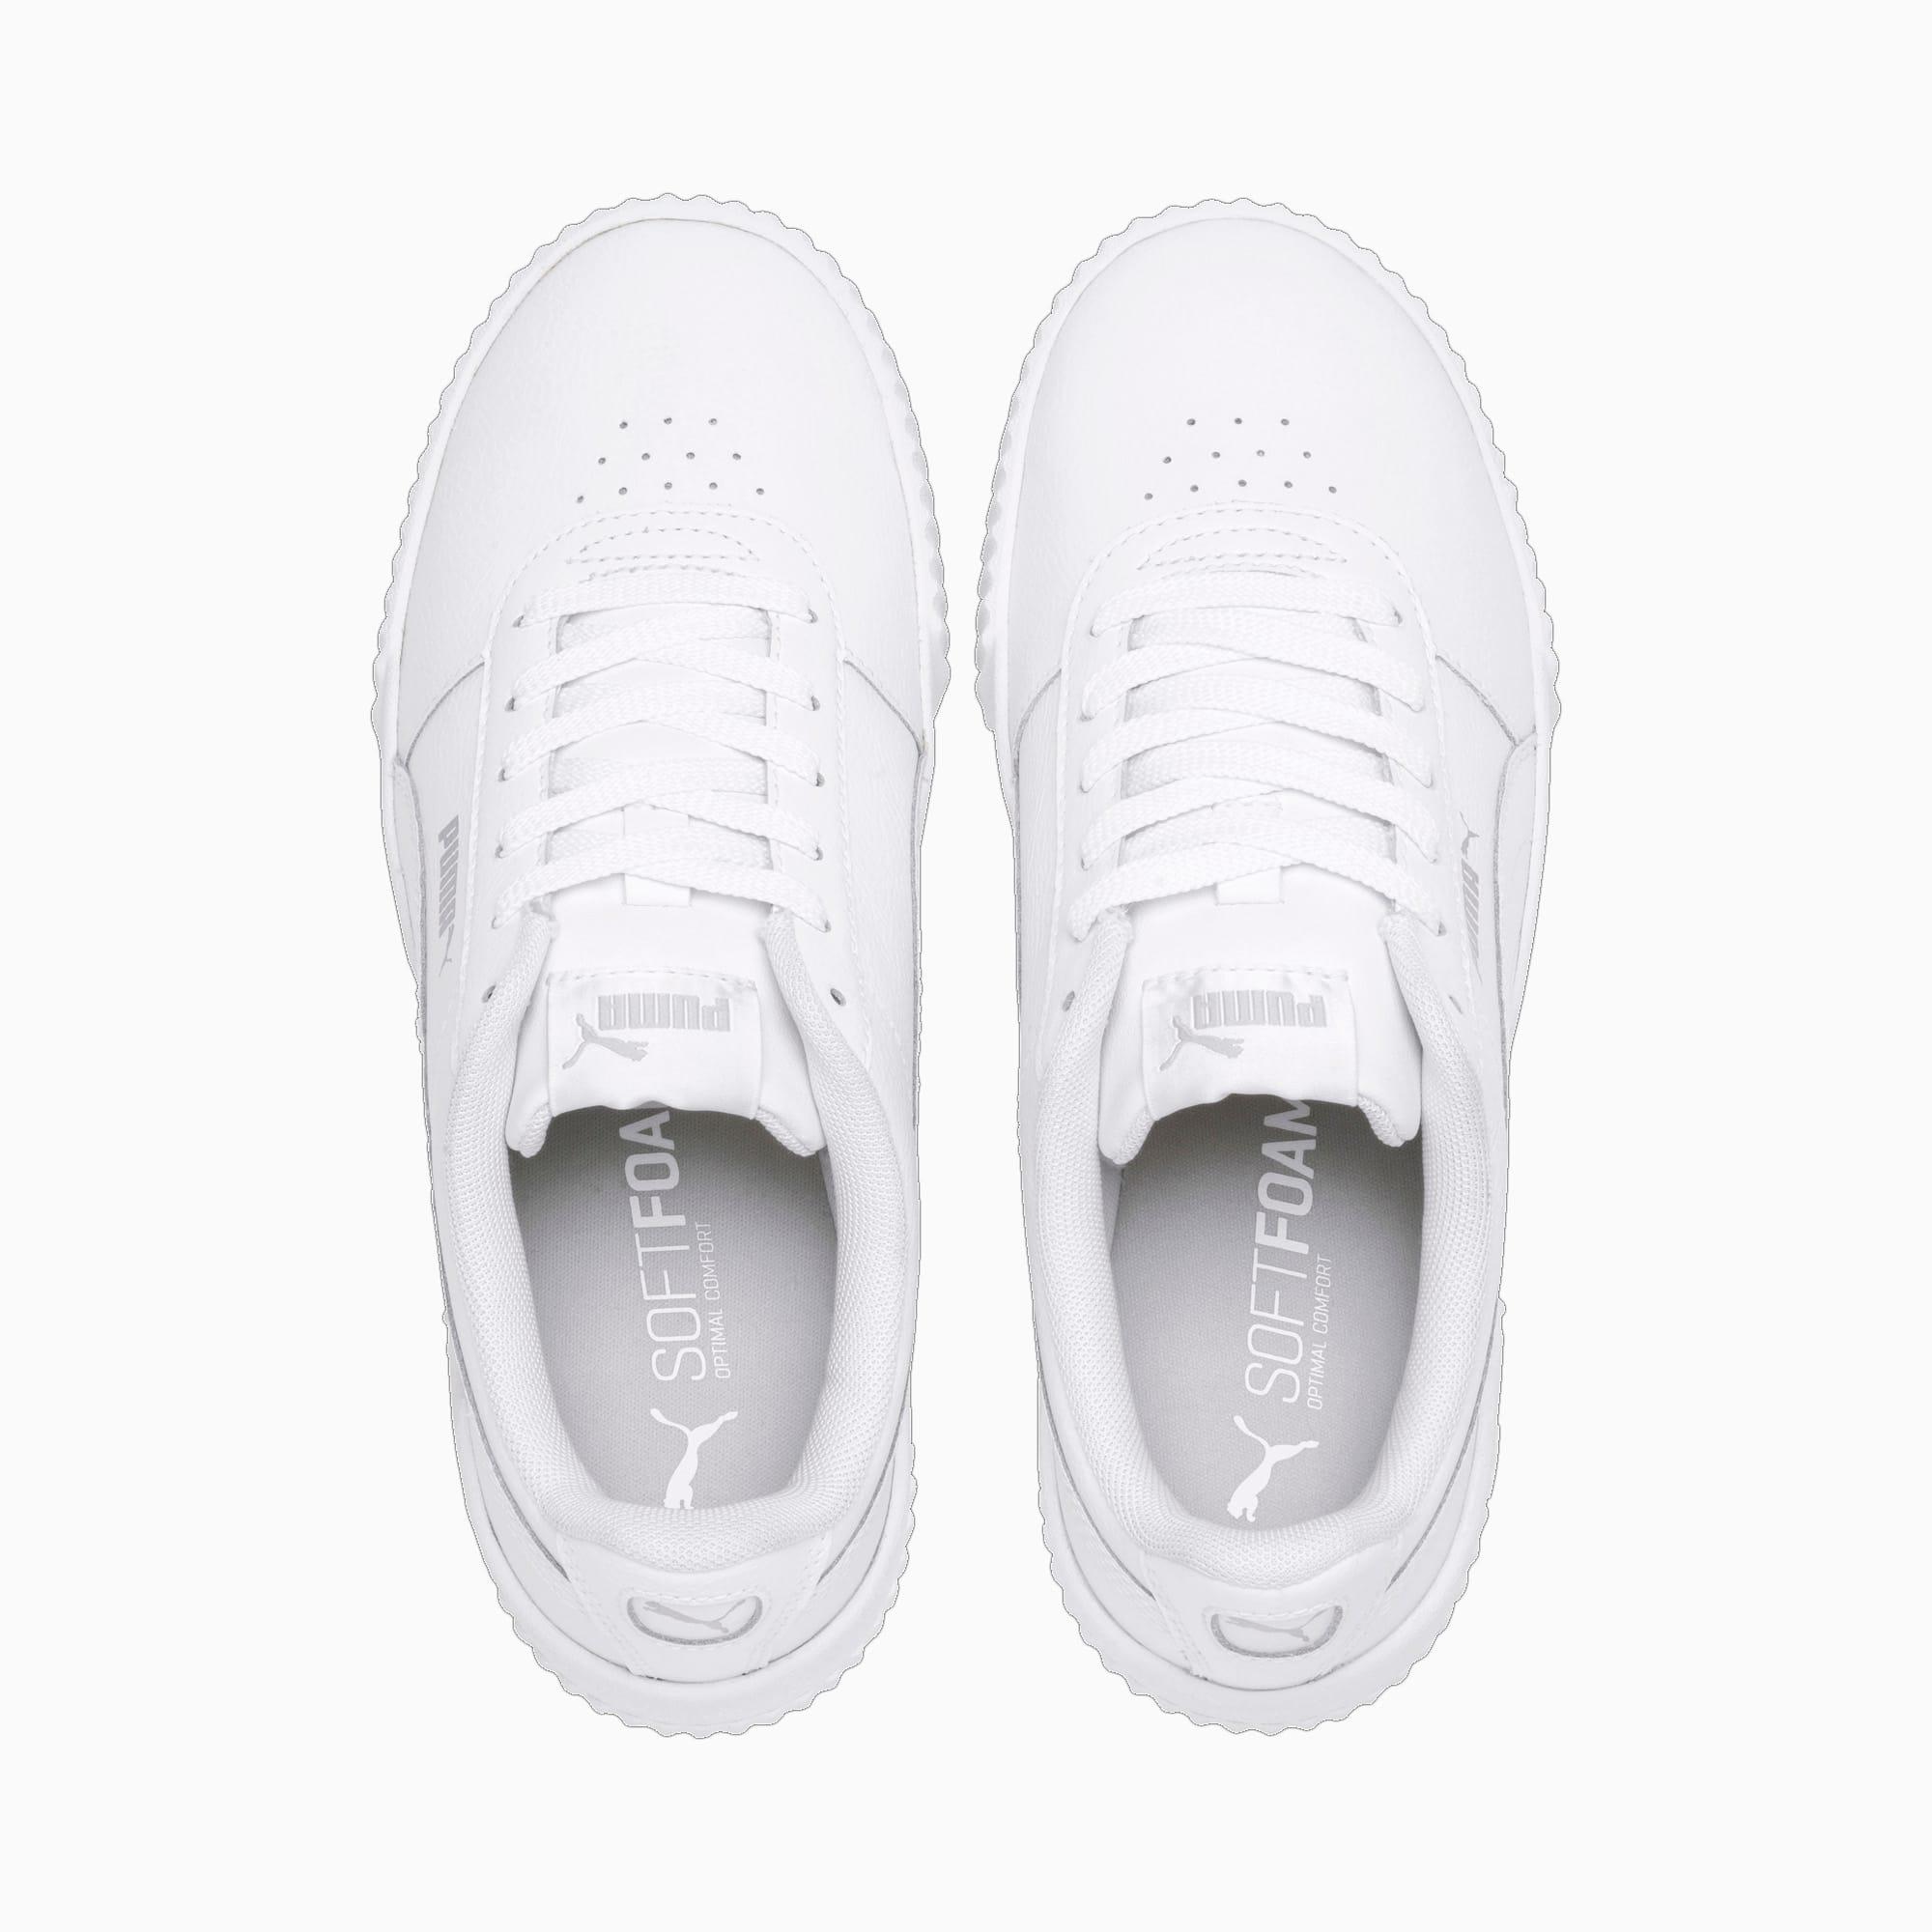 Carina Damen Sneaker | Puma White White Silver | PUMA